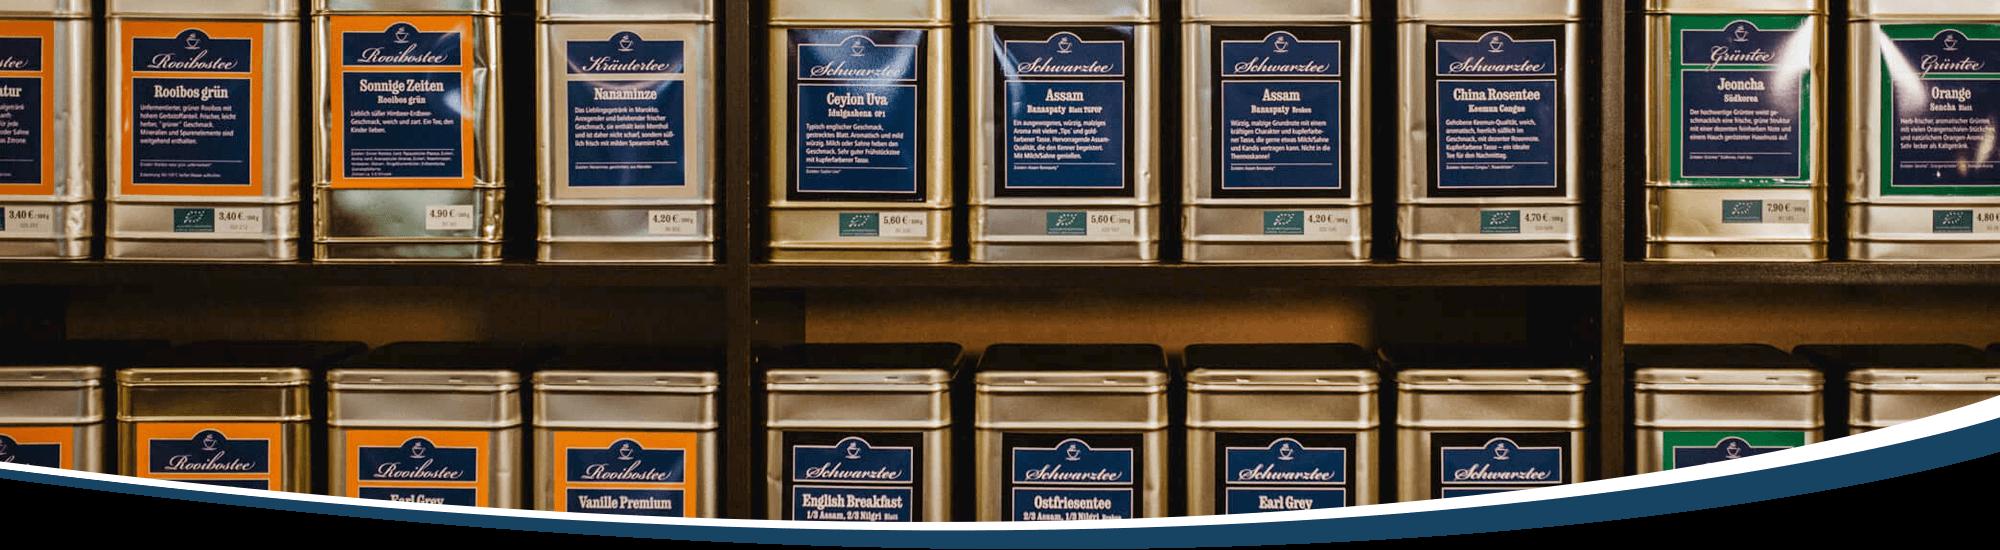 Das Teesortiment - eine Wand voller Teedosen.